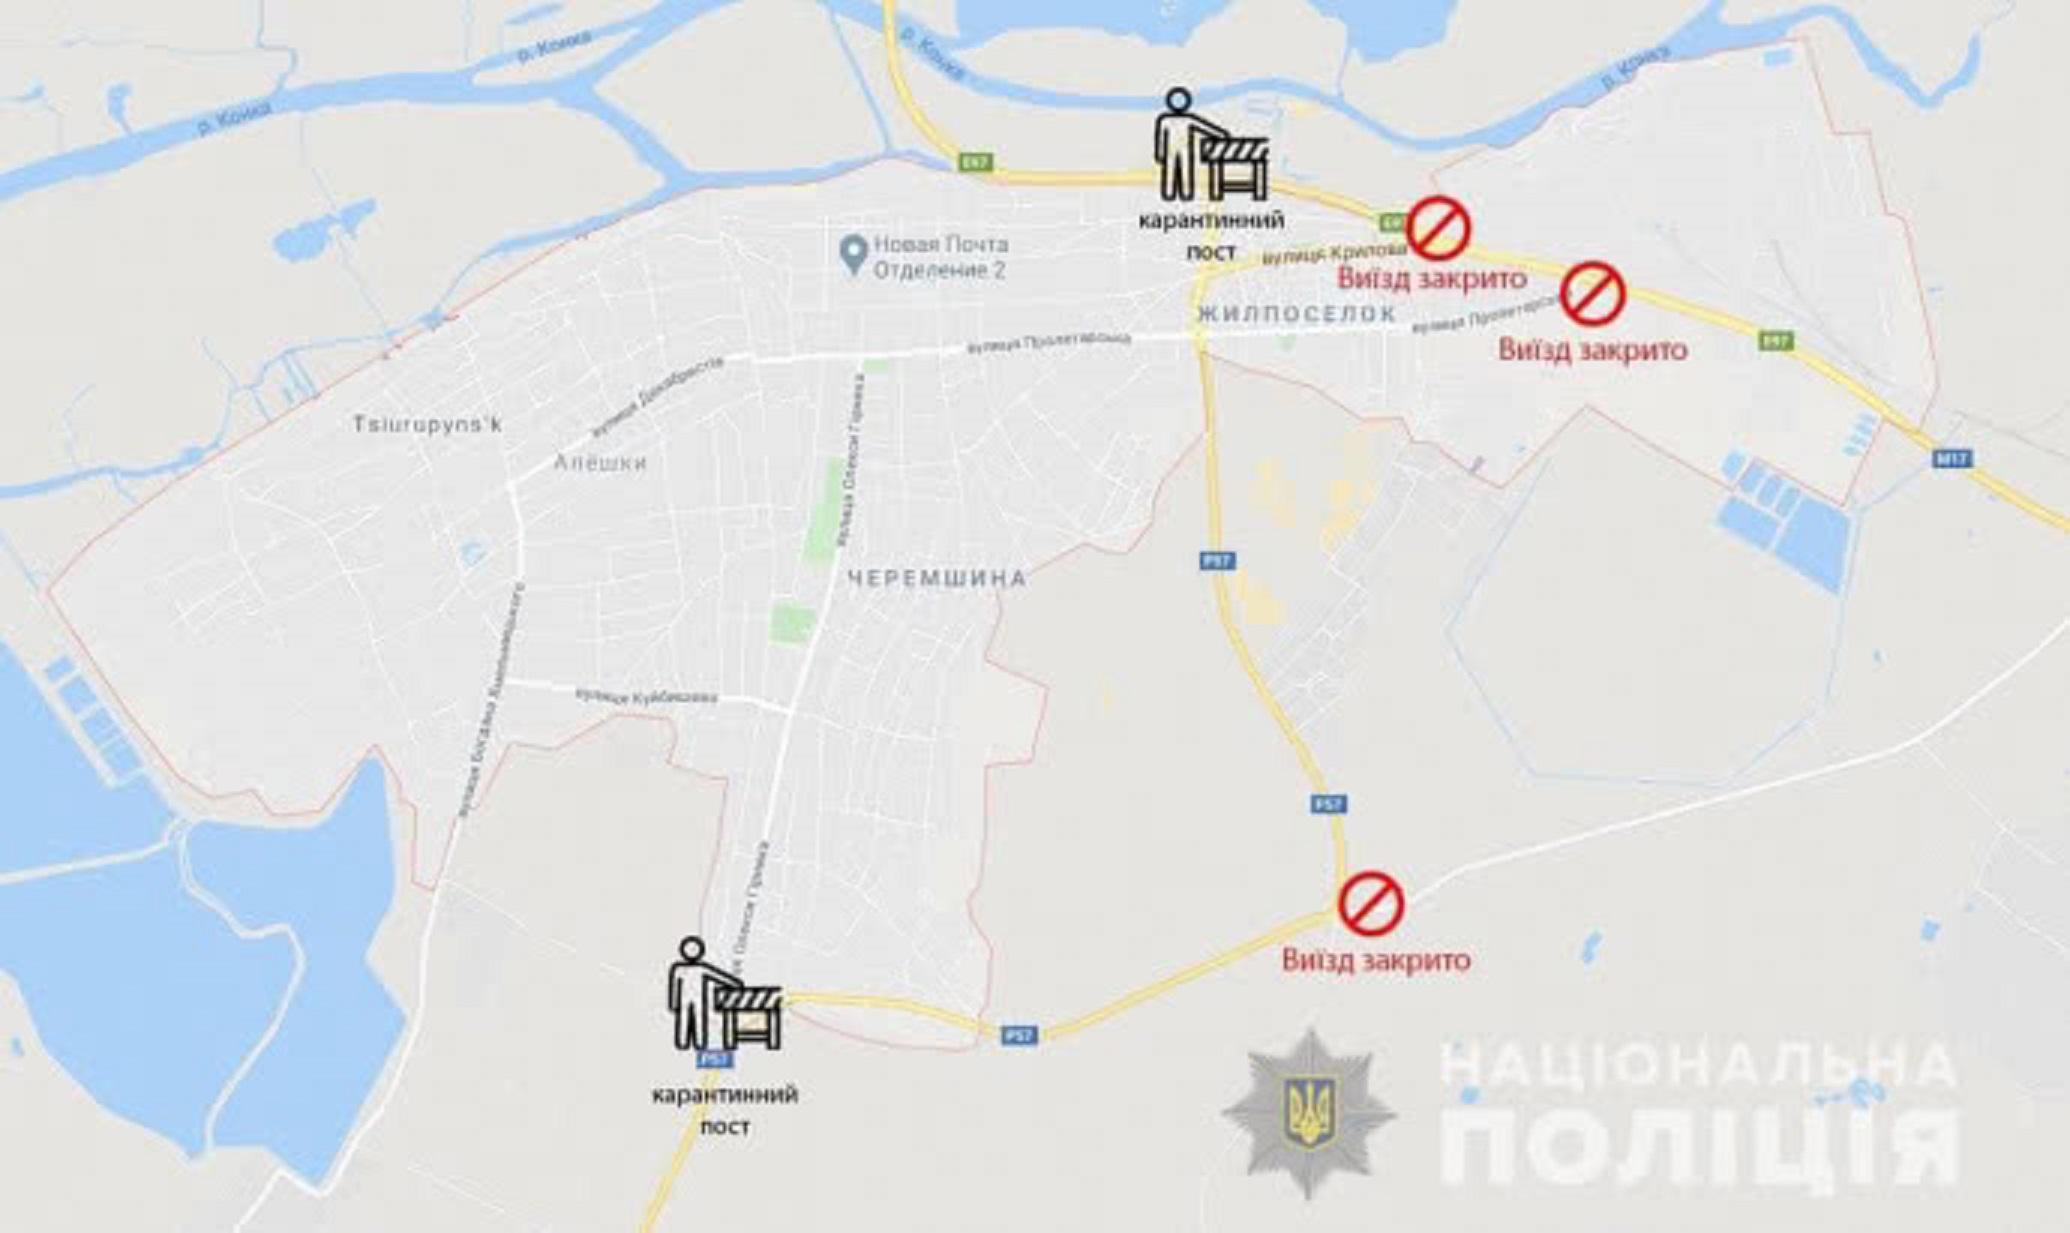 Вспышка Covid-19: в Херсонской области на карантин уходят сразу 3 города - фото 1